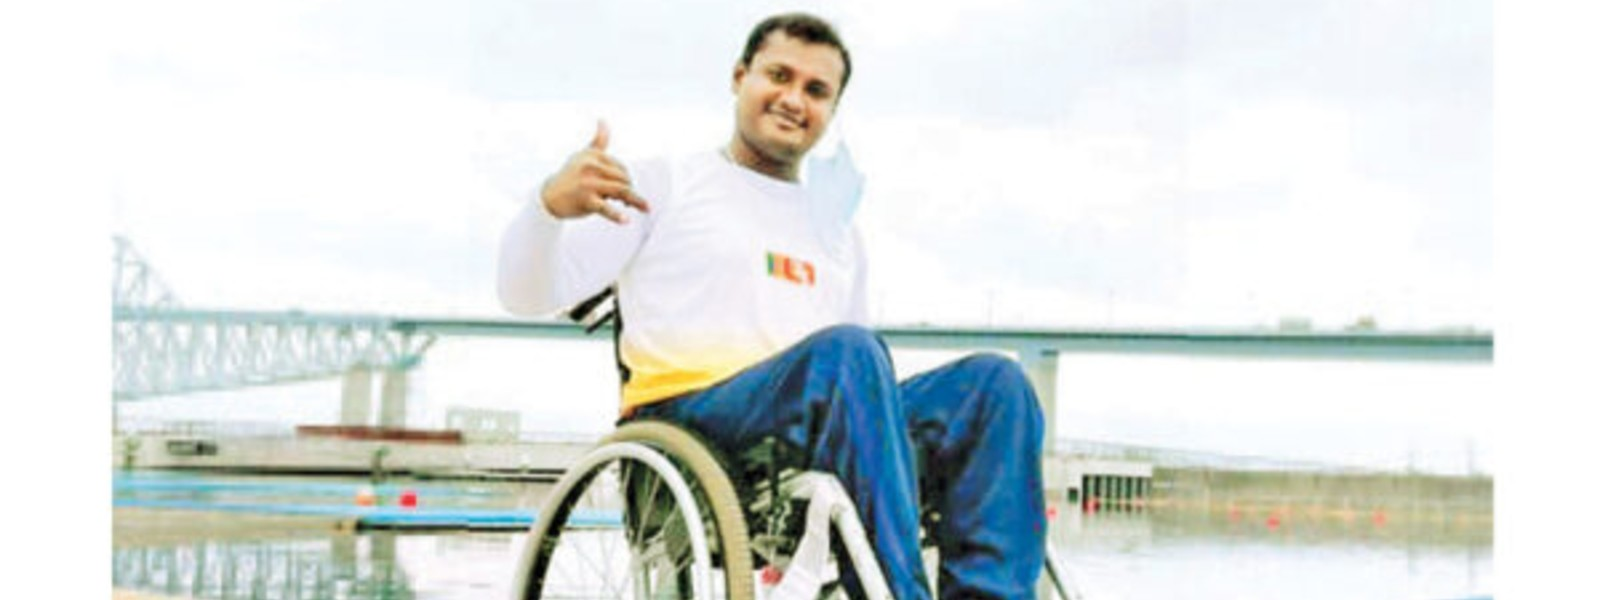 Sri Lanka's Mahesh Jayakody qualifies for Repechage Stage at Tokyo Paralympics